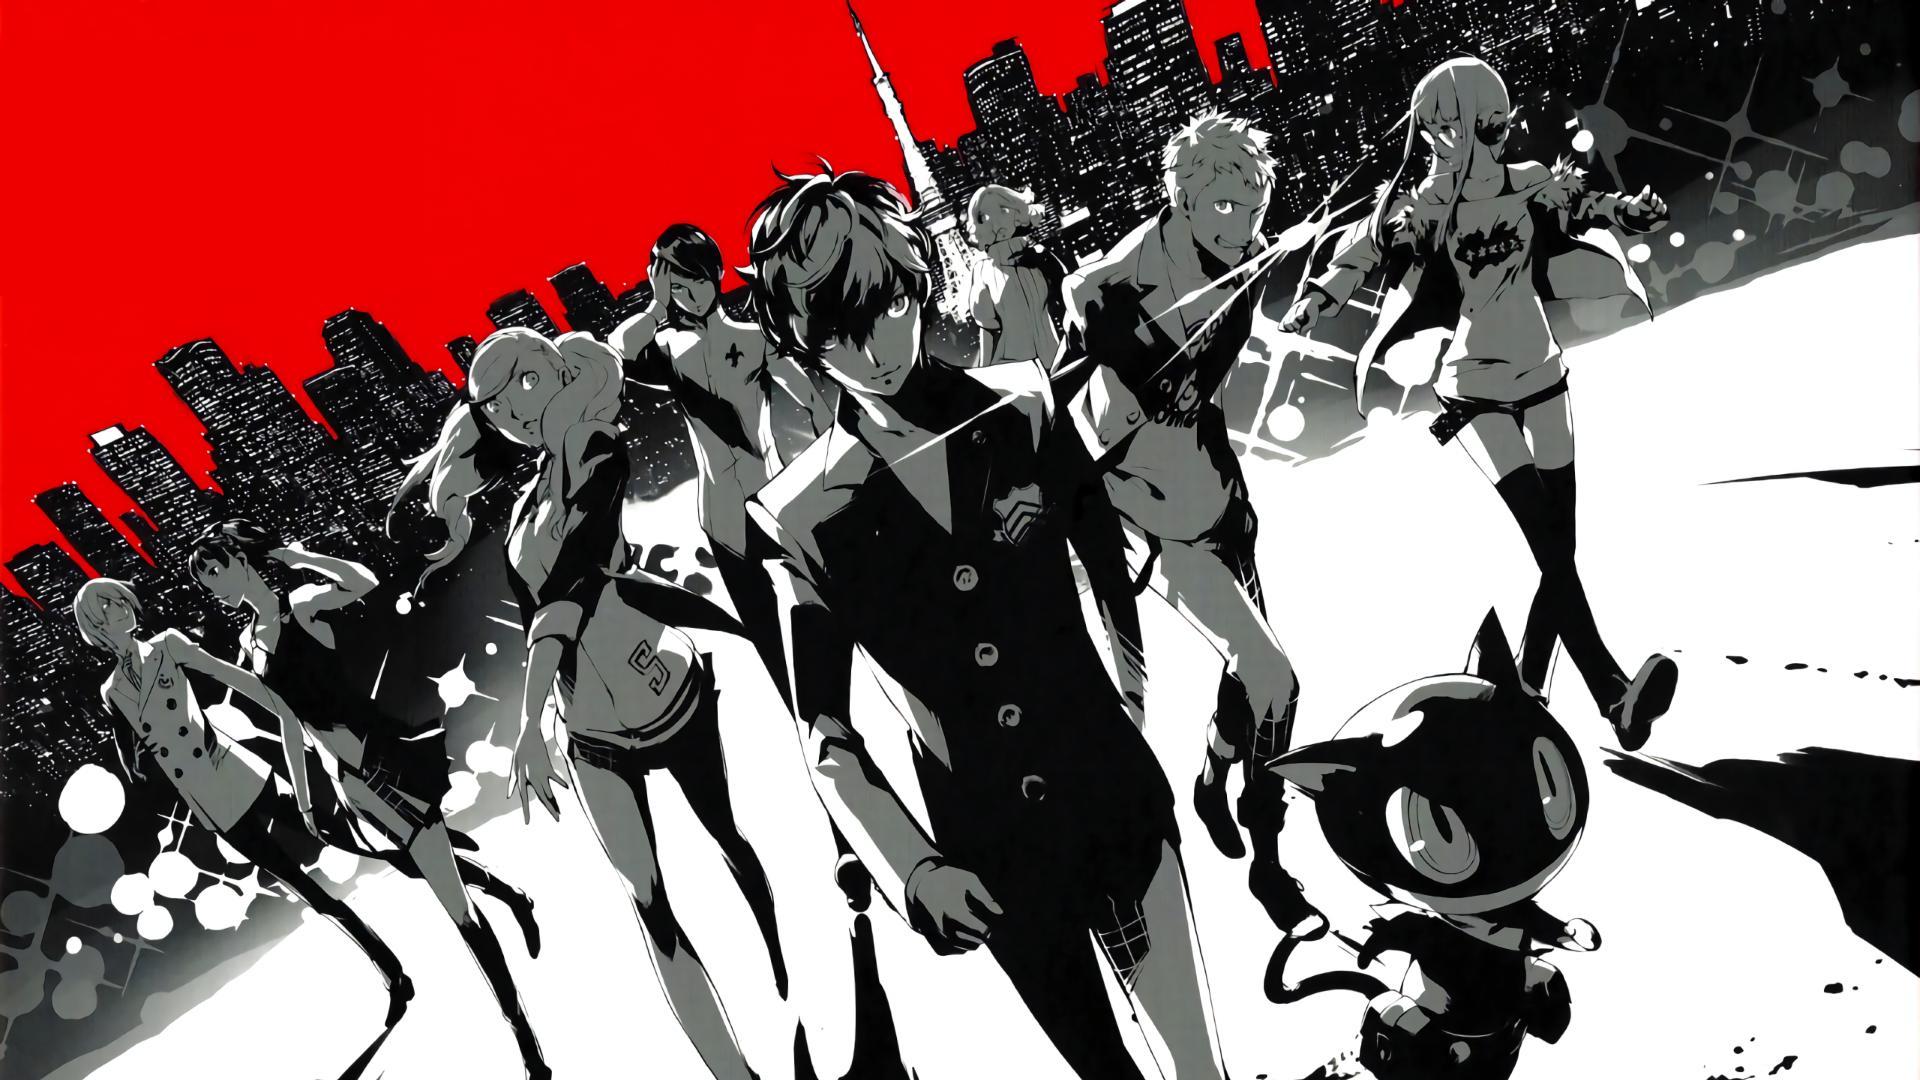 Anime 1920x1080 Phantom Thieves Persona series Persona 5 Protagonist (Persona 5) Sakura Futaba Ryuji Sakamoto Makoto Niijima Ann Takamaki  Morgana Yusuke Kitagawa Goro Akechi